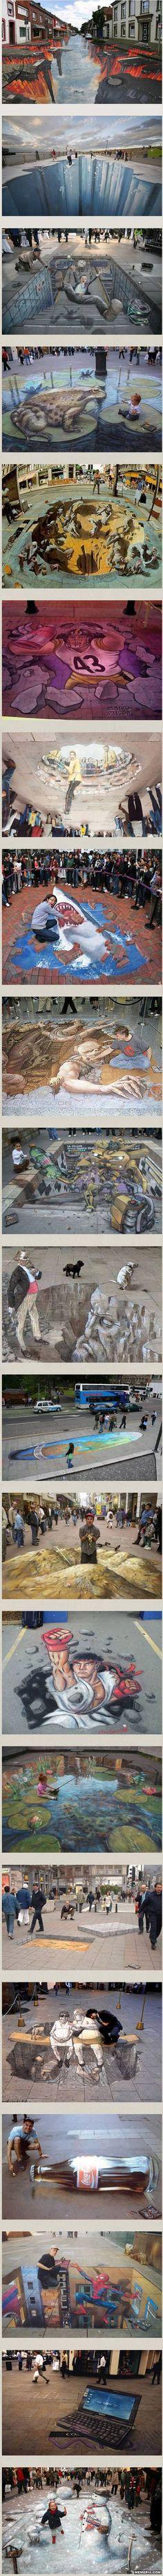 Extreme Sidewalk Chalk